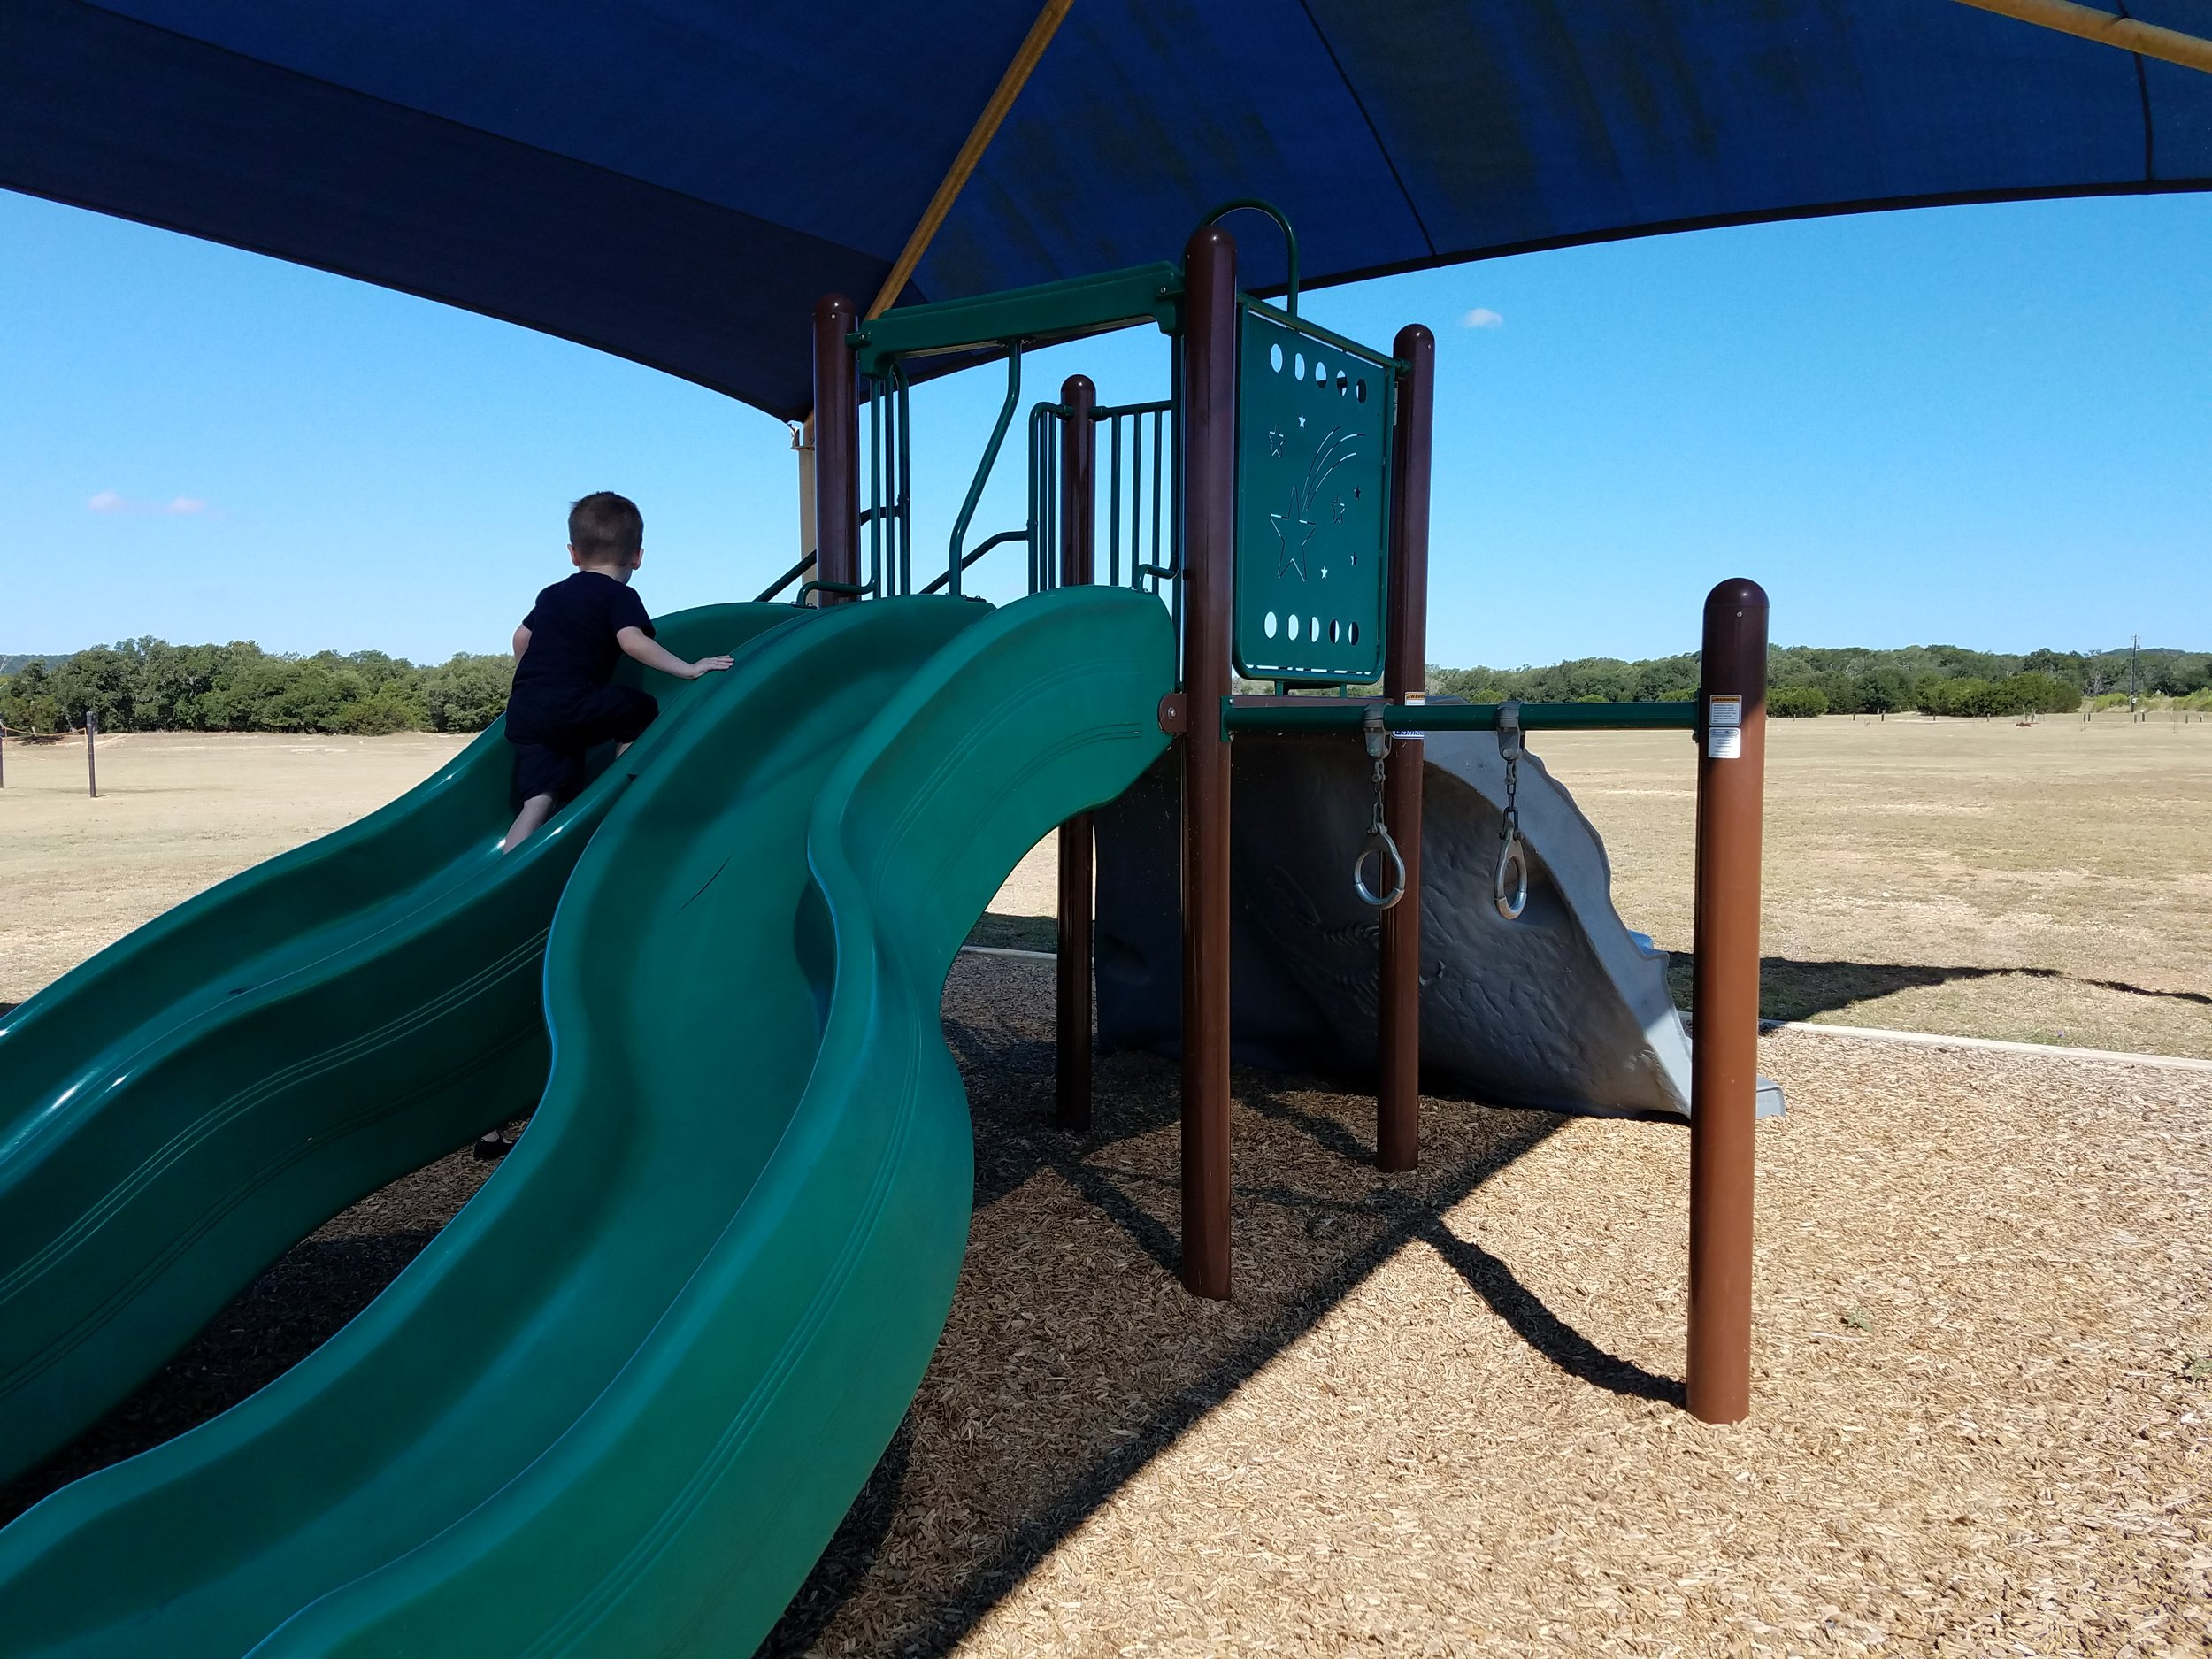 Boerne City Lake Park